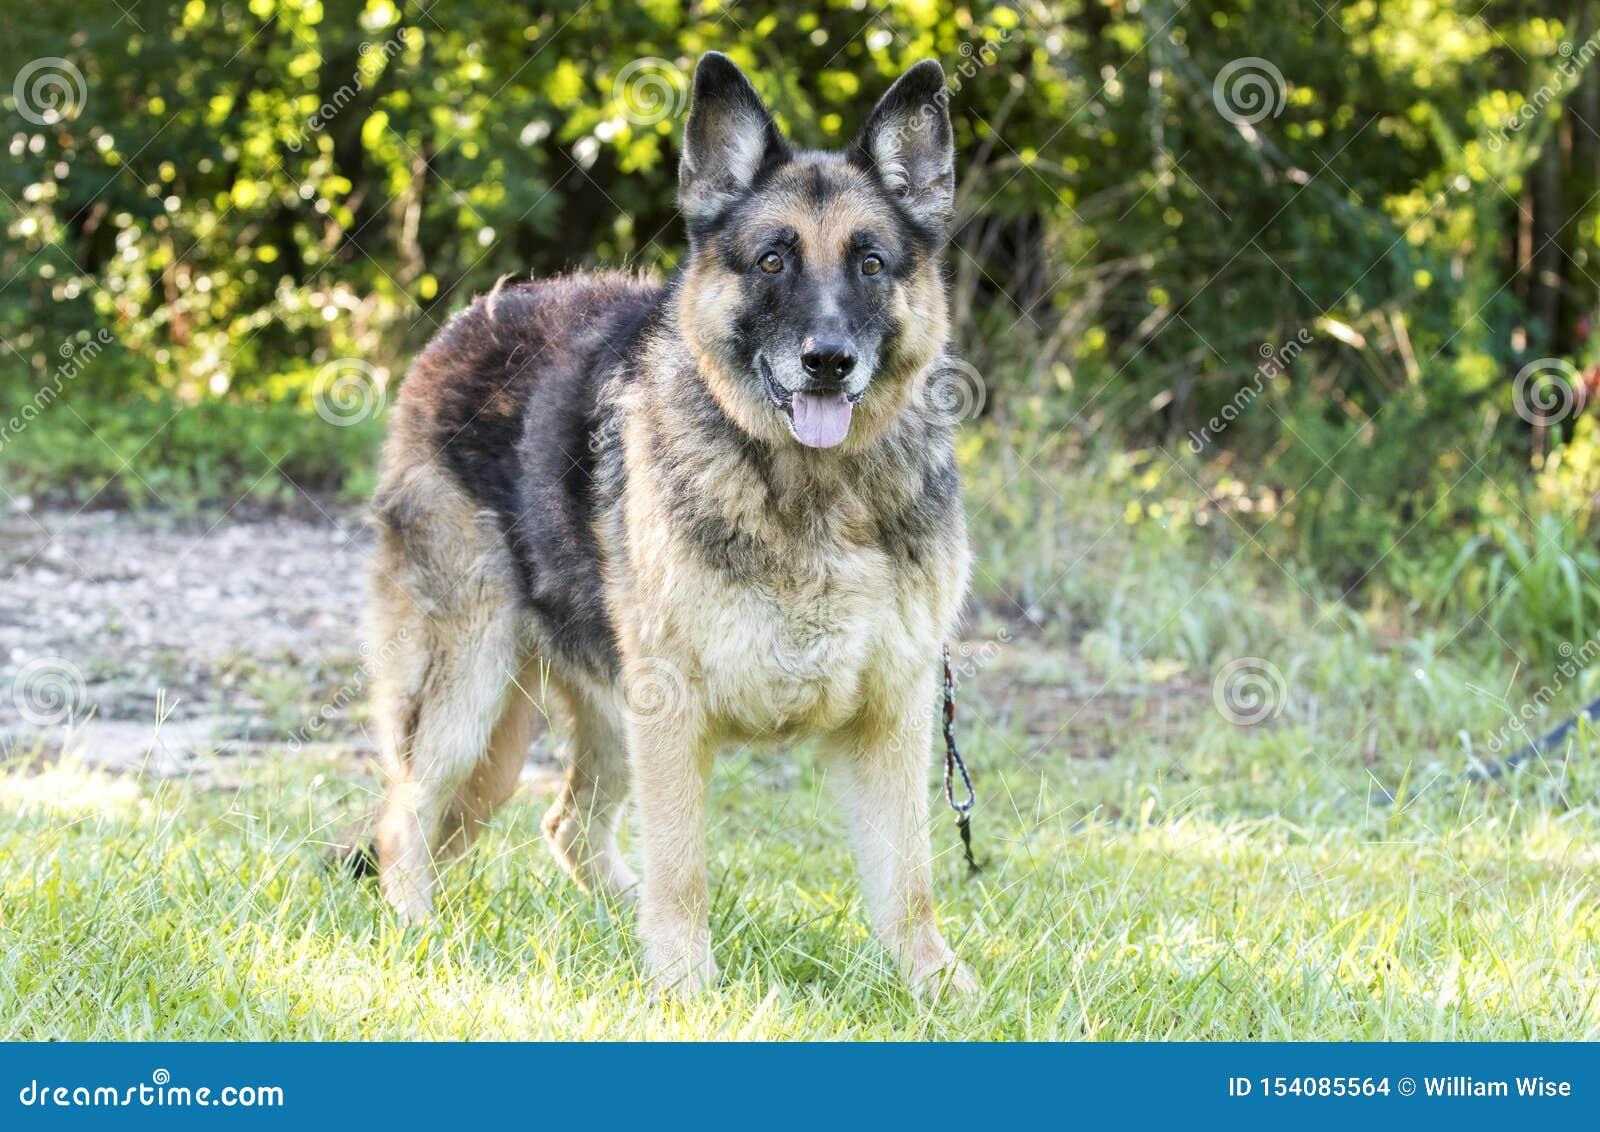 Senior German Shepherd Dog outside on leash